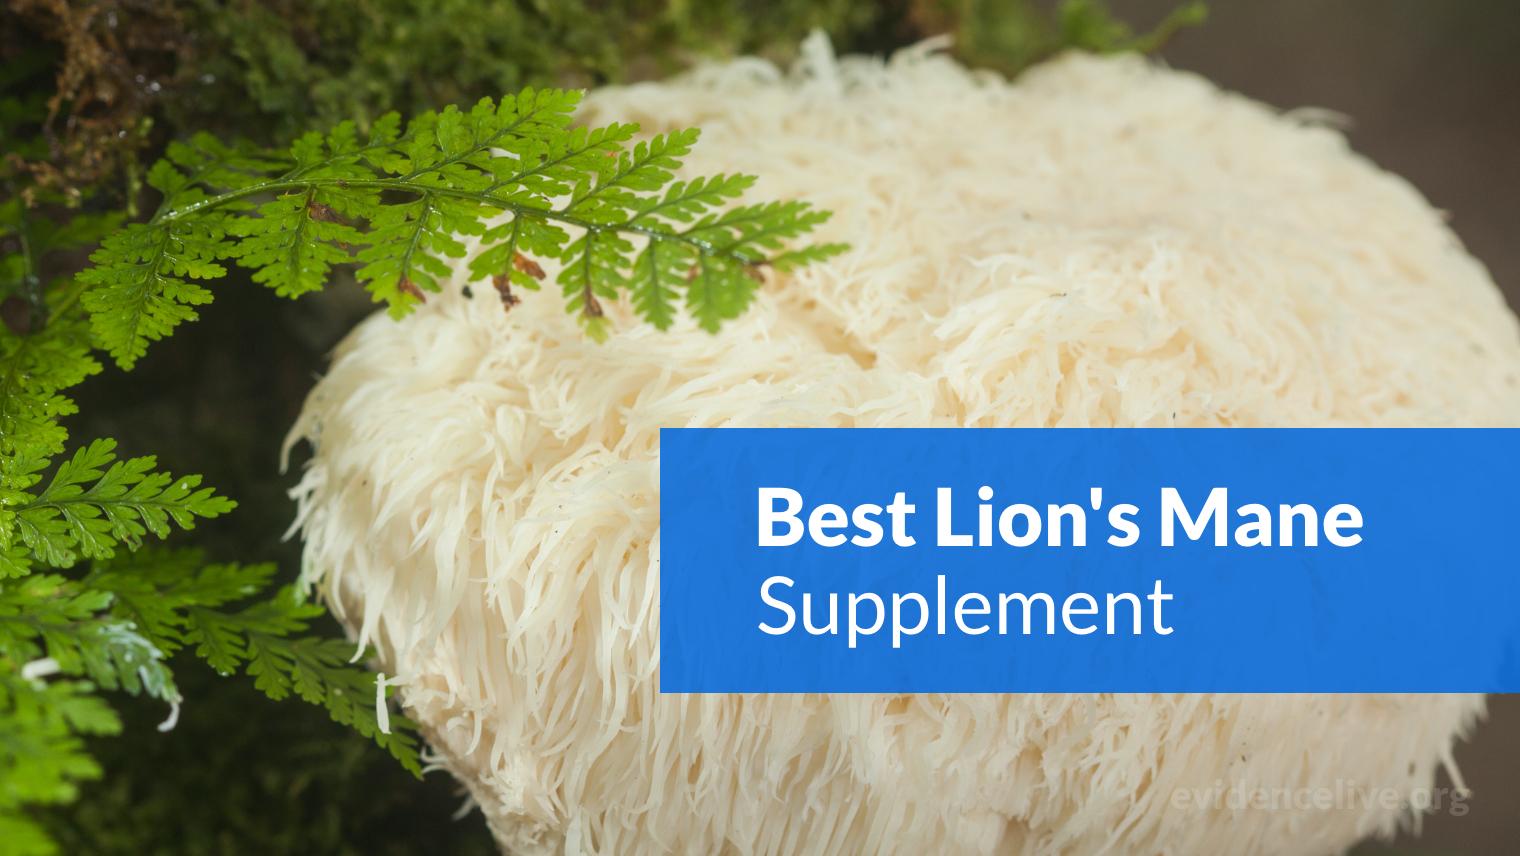 Best Lion's Mane Mushroom Supplement (Capsules & Powder)